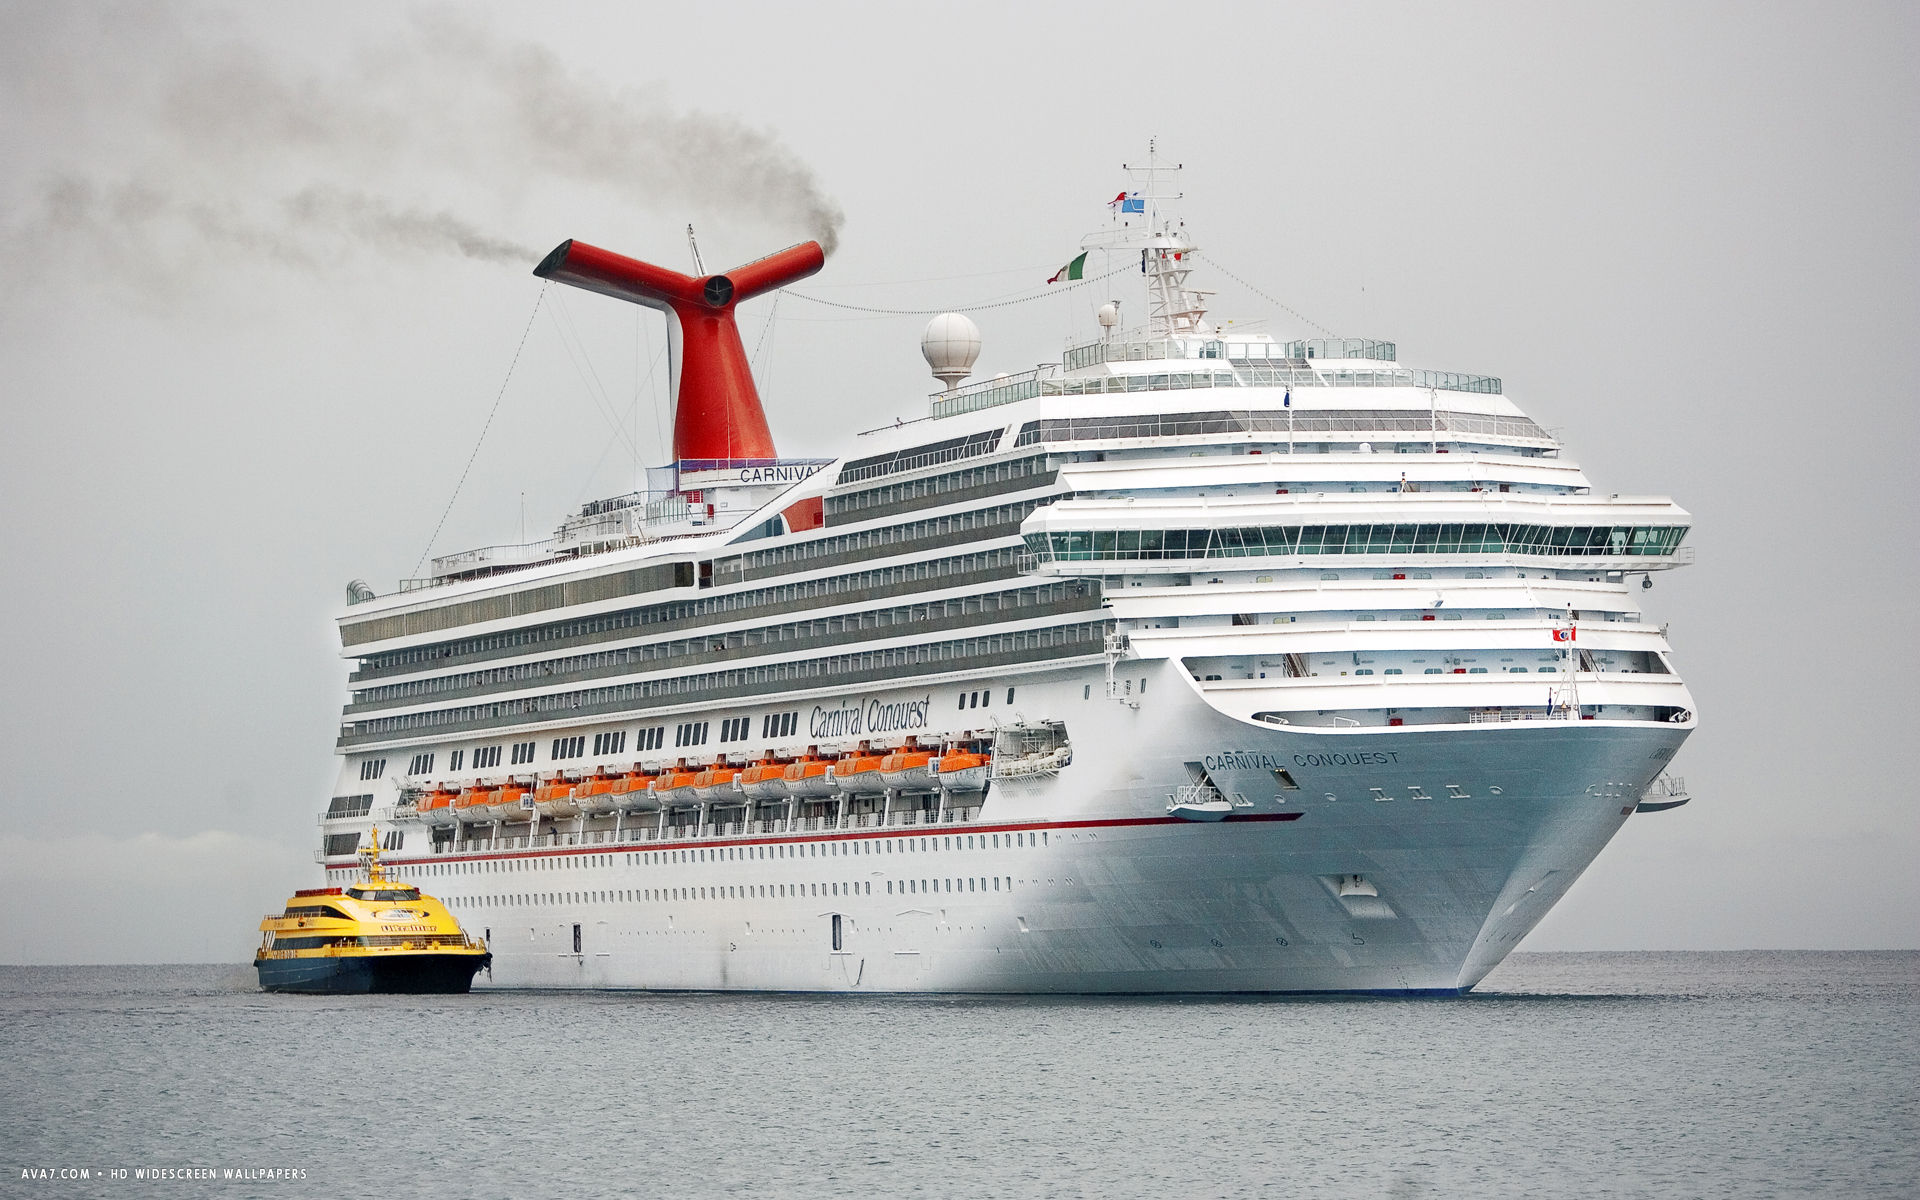 carnival conquest cruise ship hd widescreen wallpaper cruise ships 1920x1200